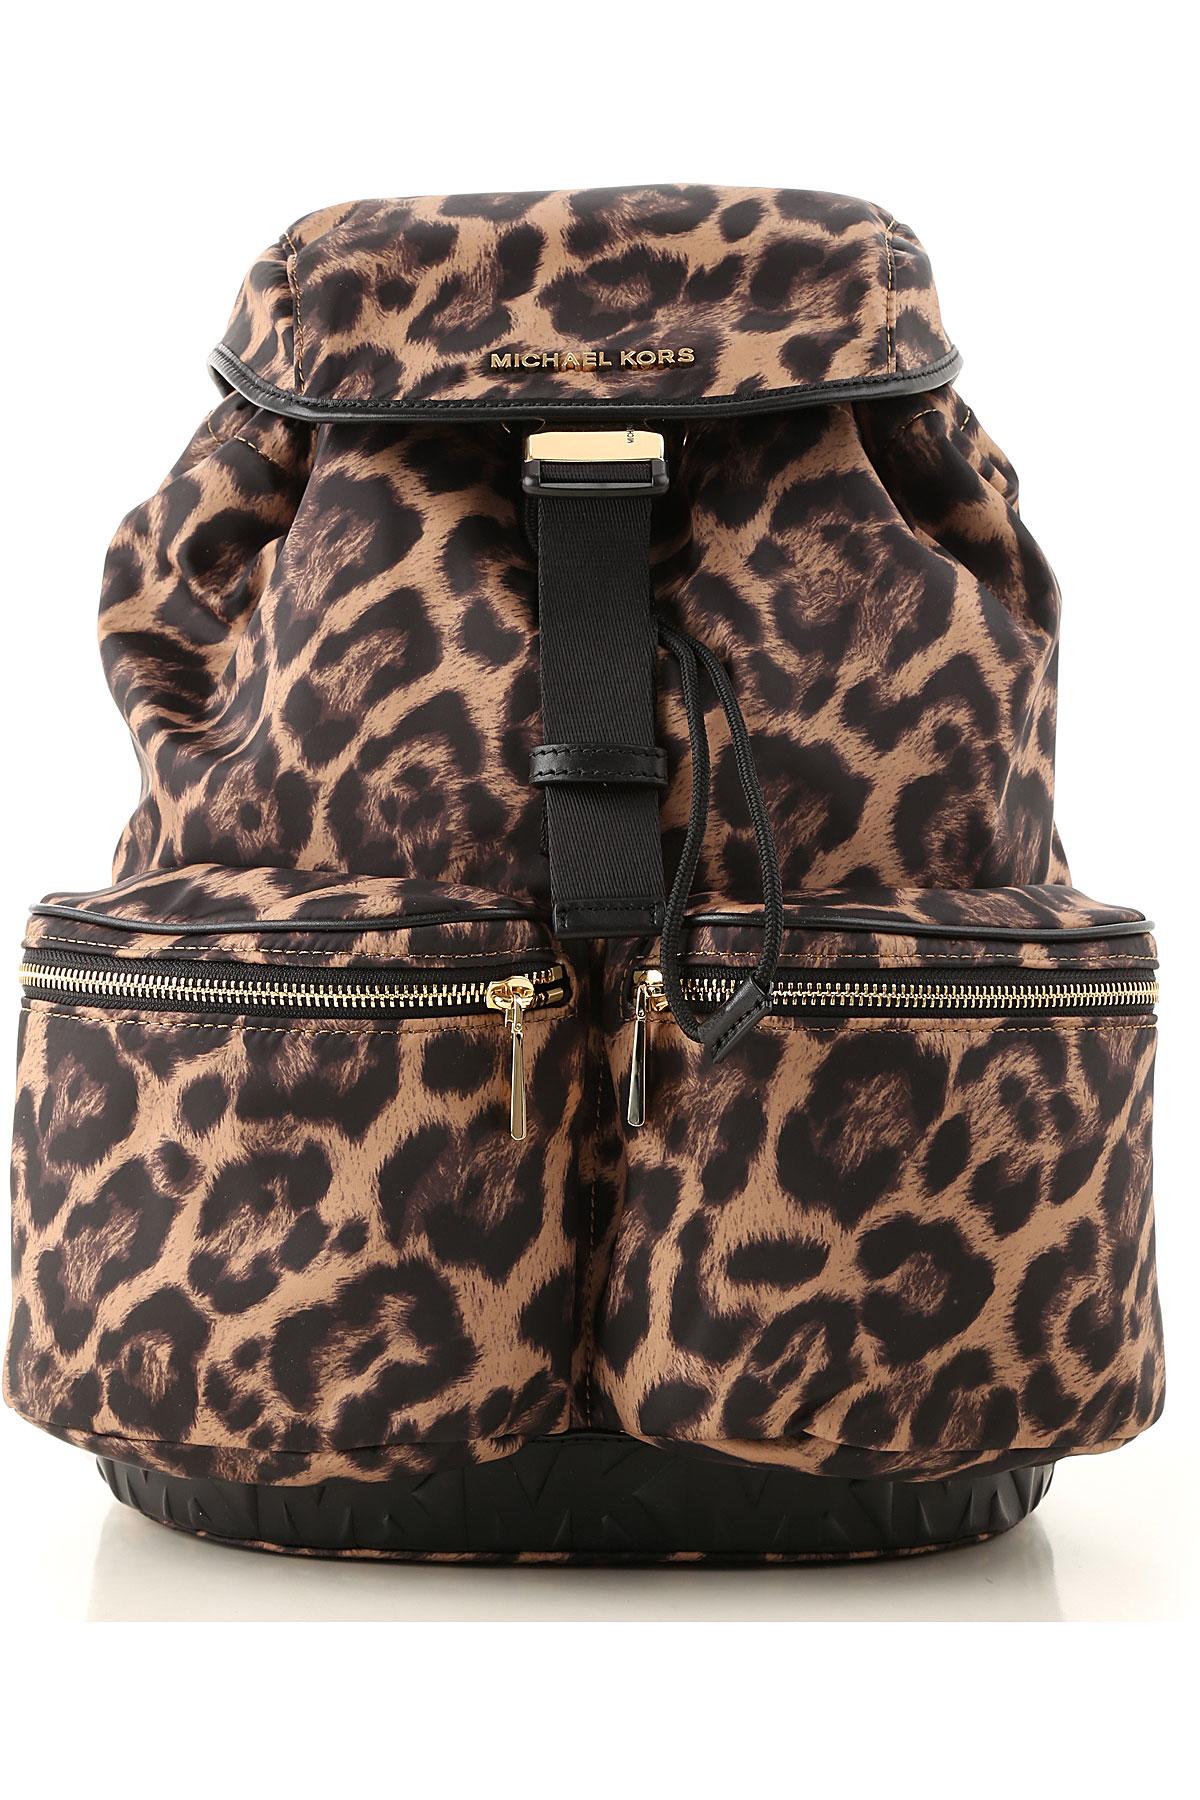 Michael Kors Backpack for Women On Sale, Spotted Brown, Nylon, 2019